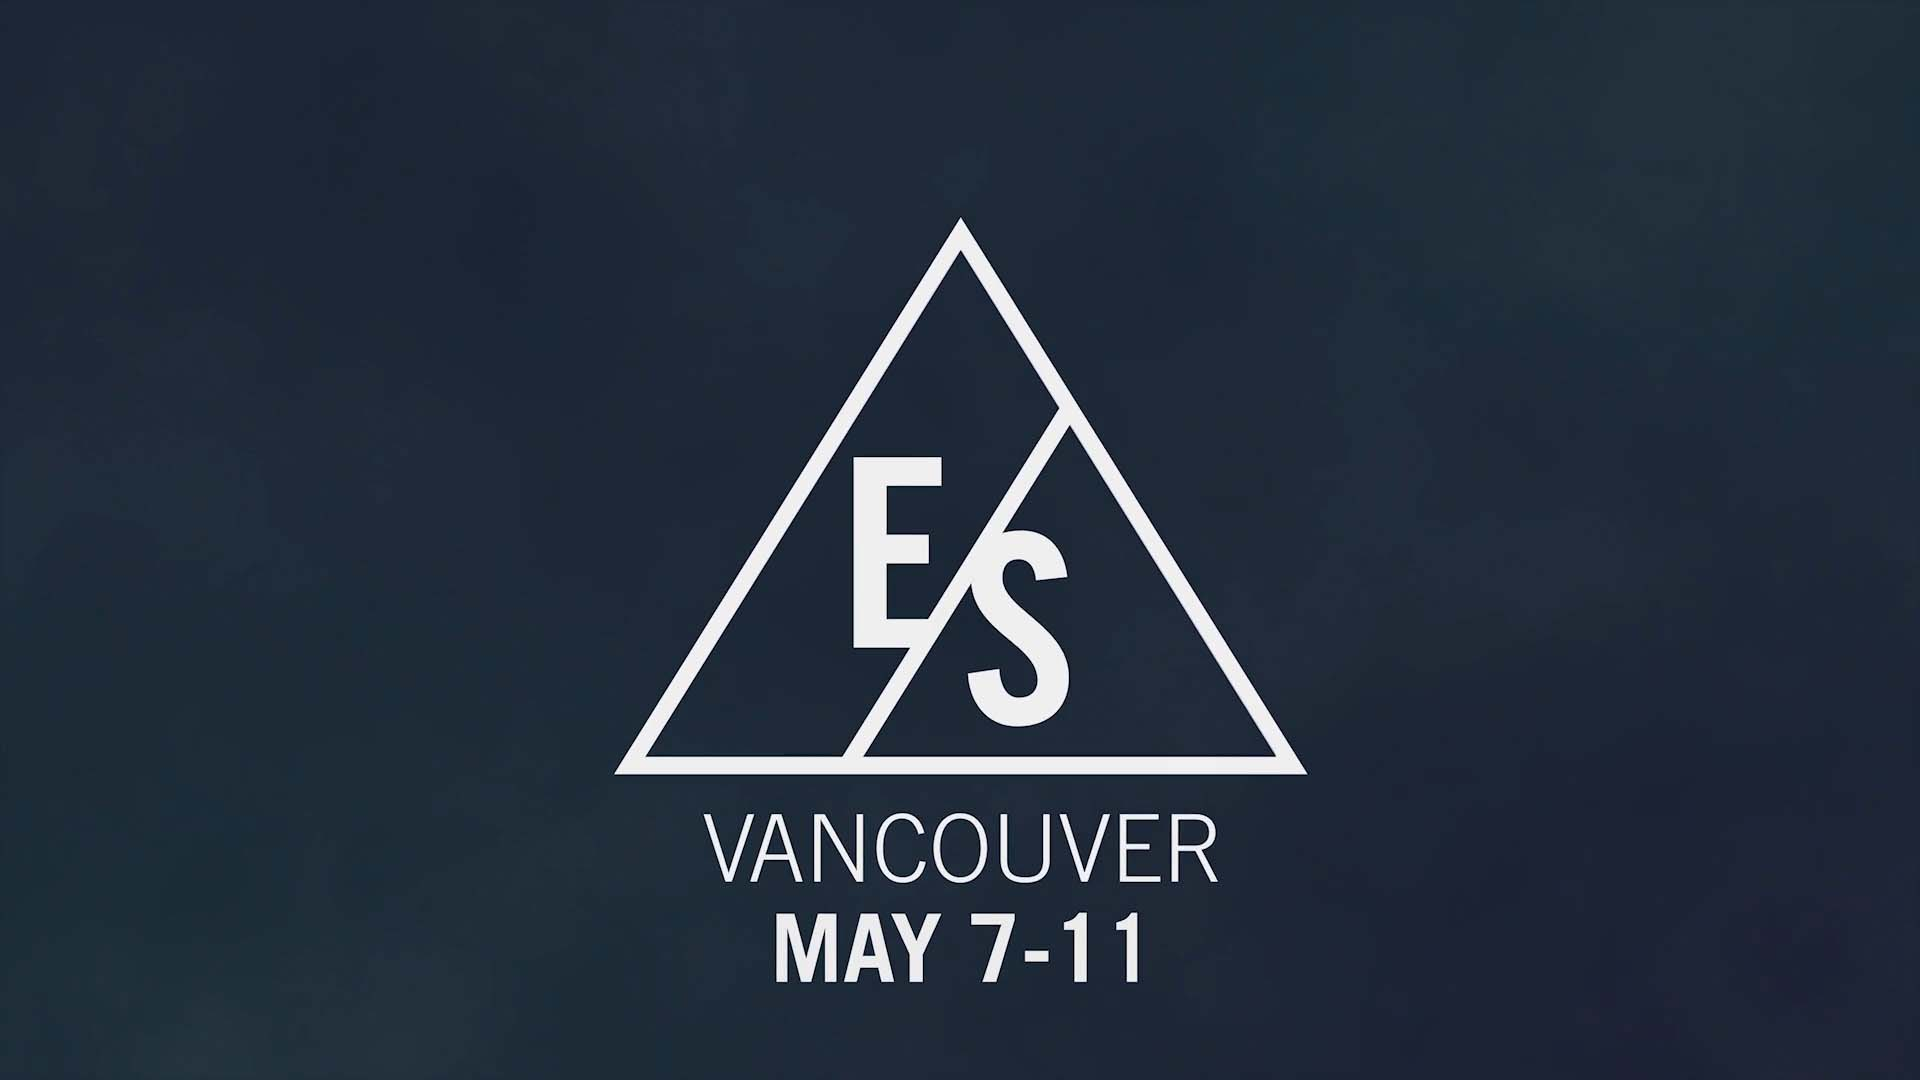 Original Summit Branding